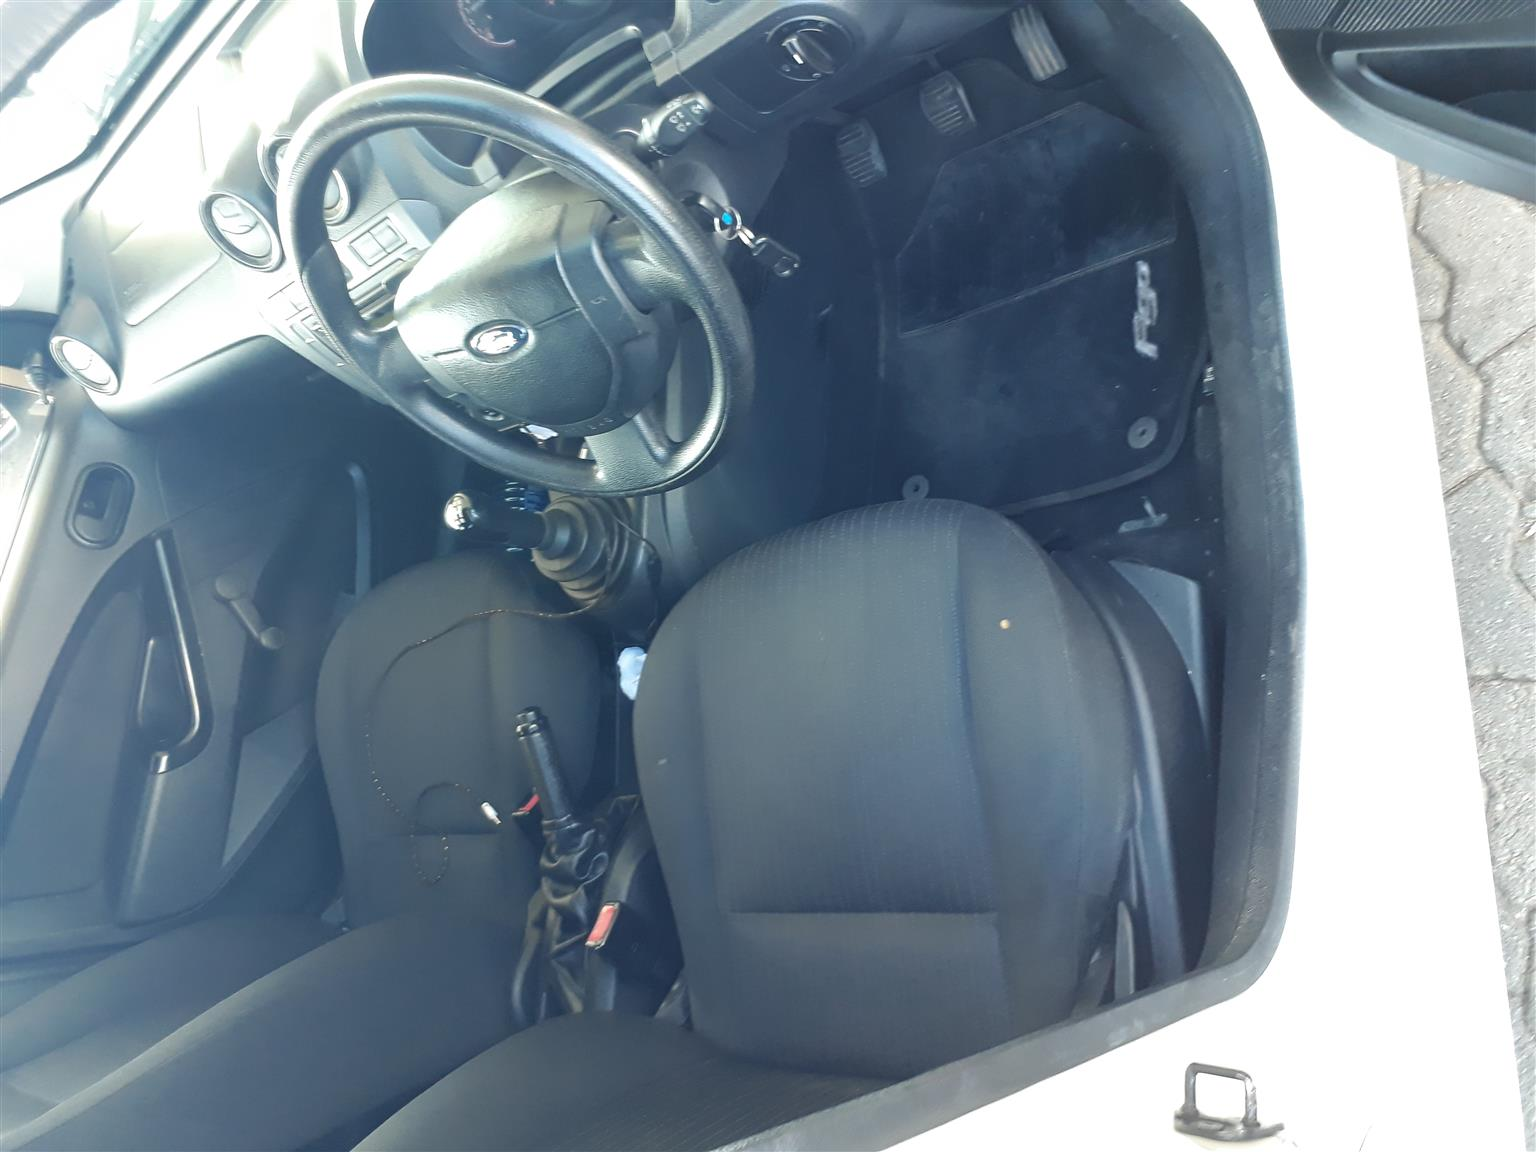 2014 Ford Focus 16 5 Door Ambiente Junk Mail Seats